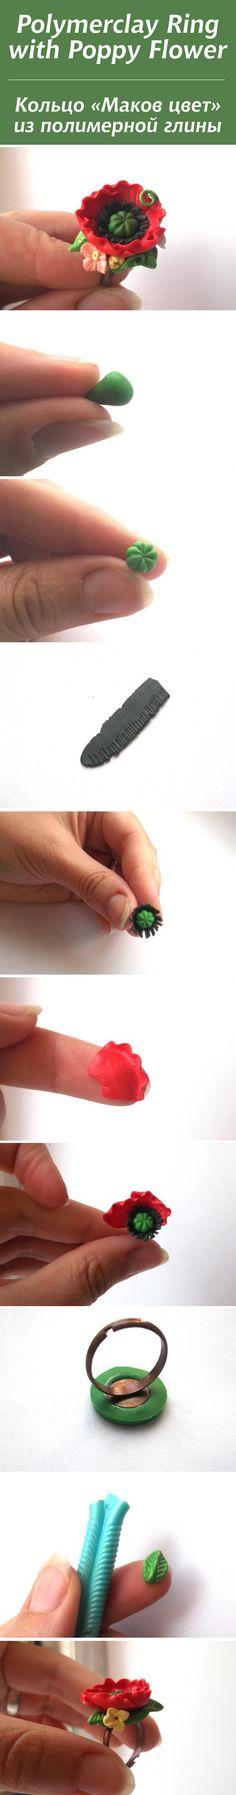 "Polymerclay Ring with Poppy Flower / Кольцо ""Маков цвет"" из полимерной глины #polymerclay"